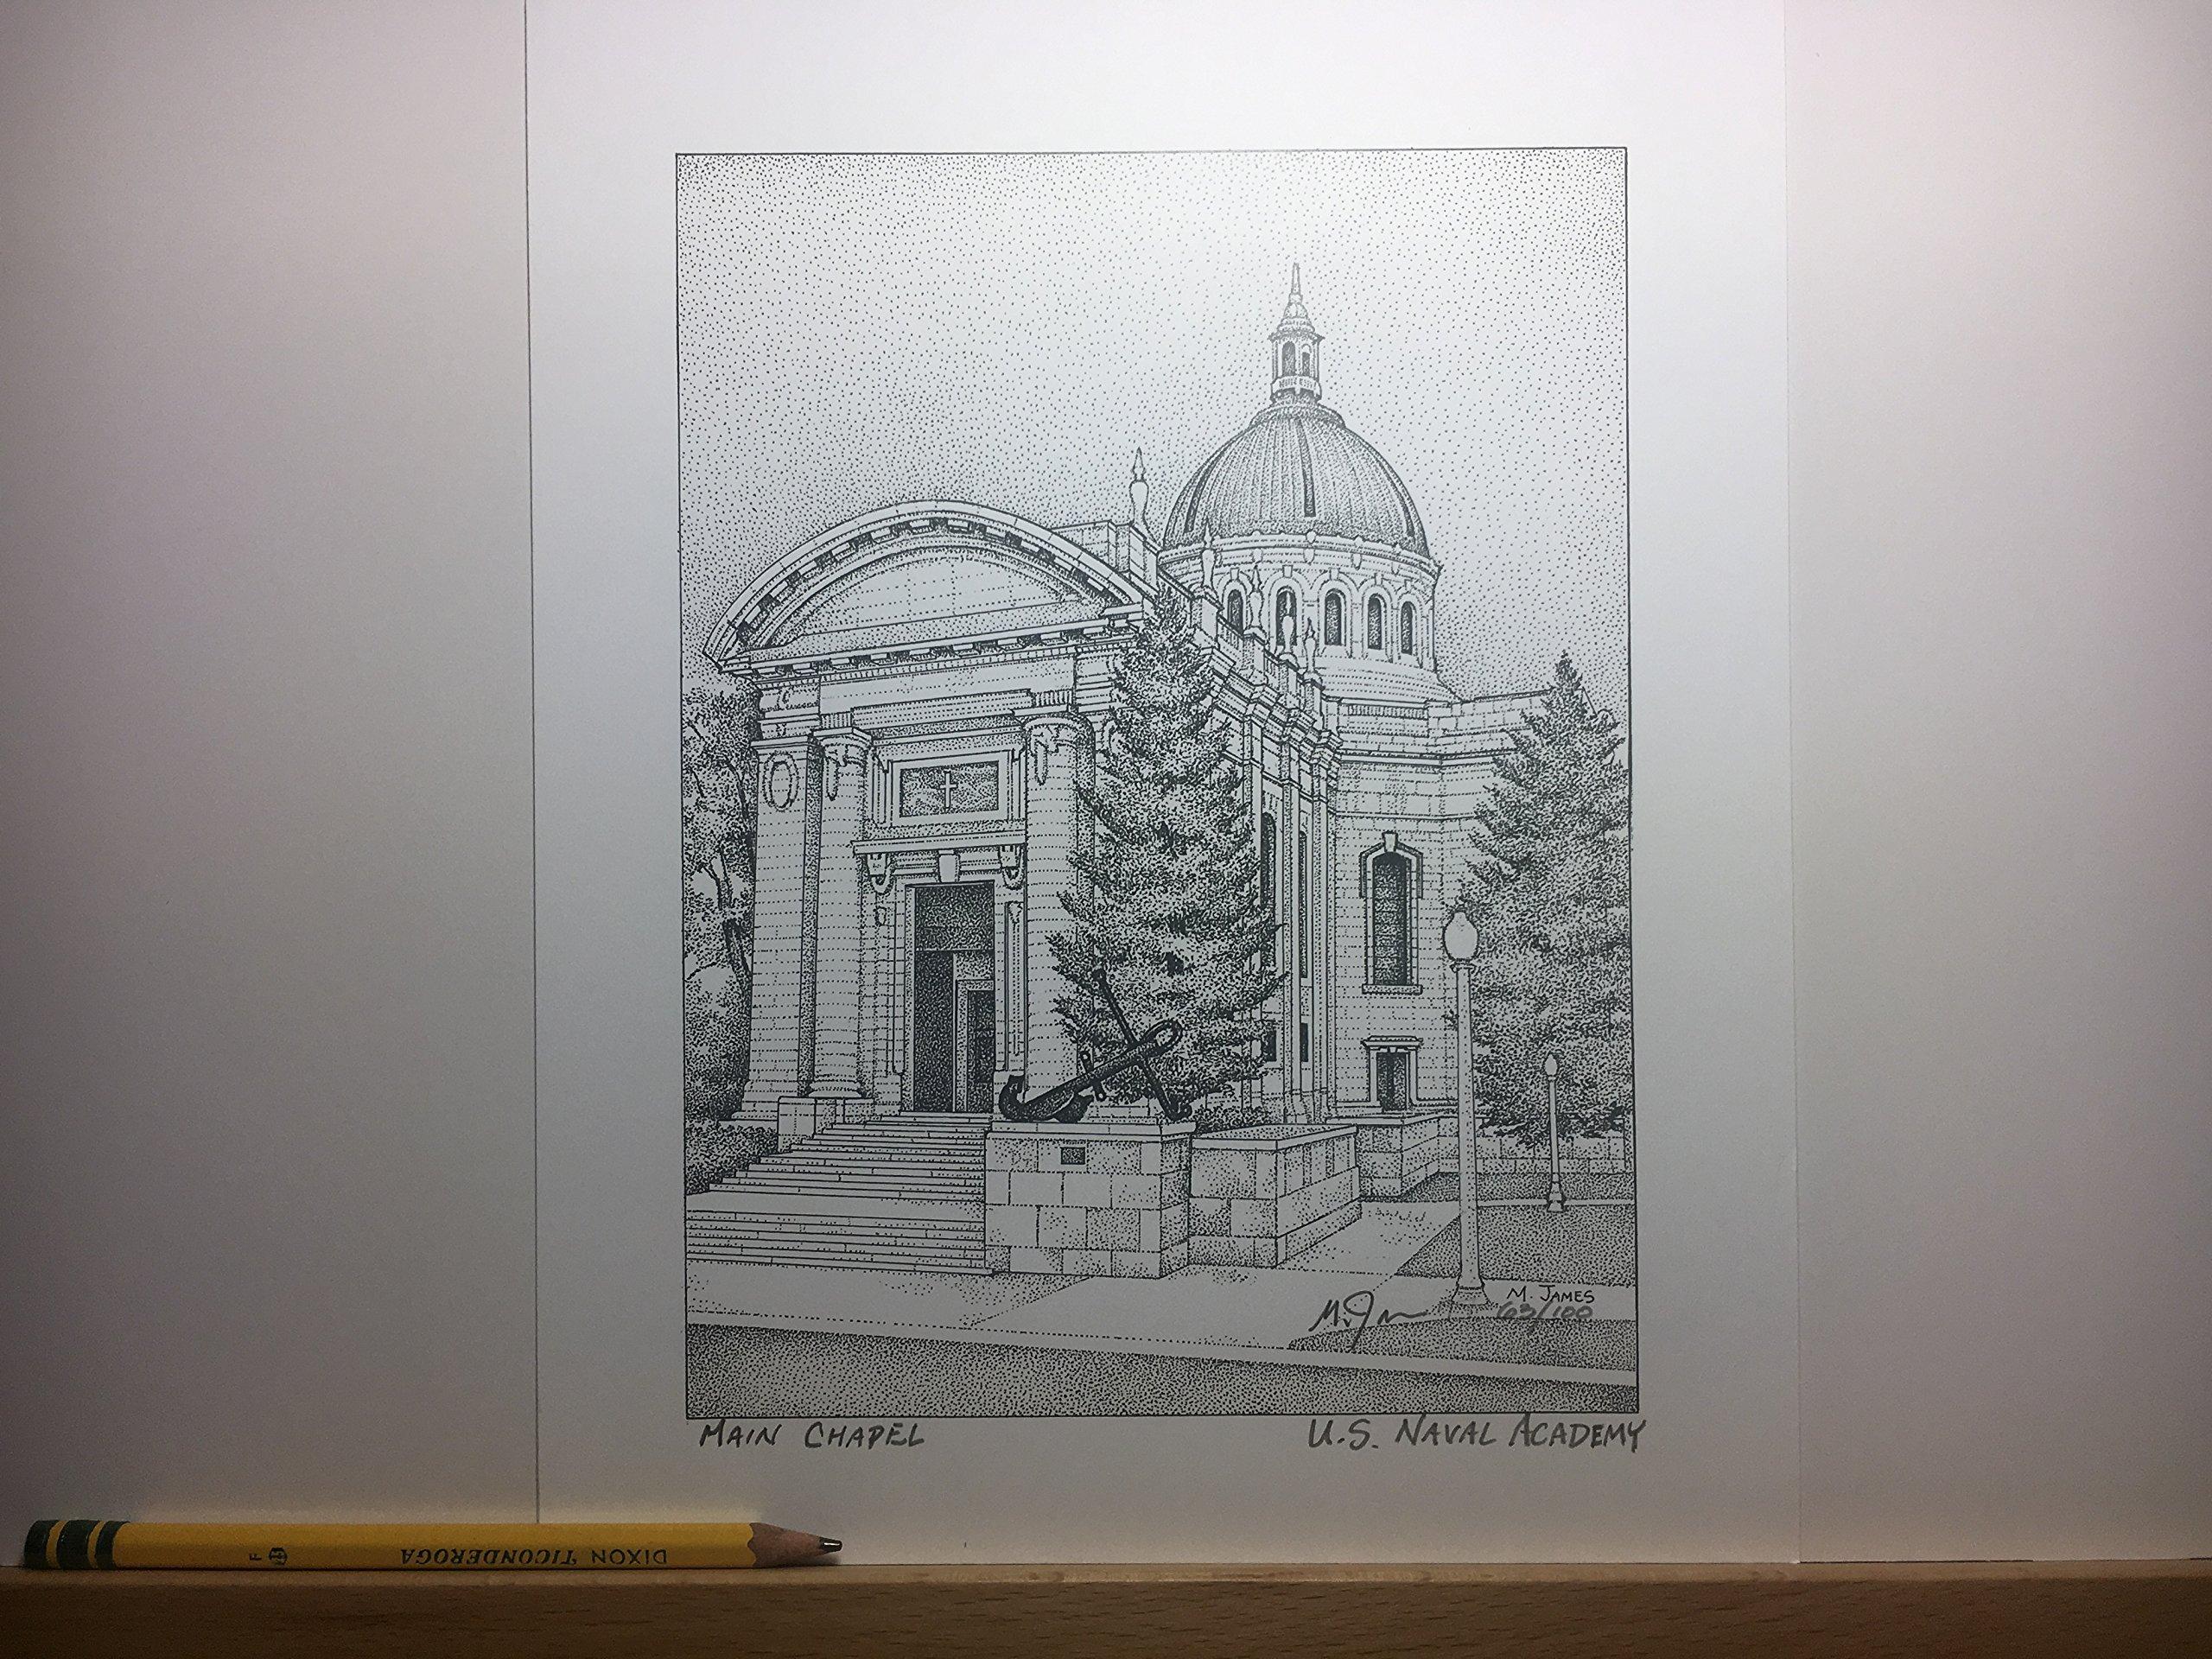 Naval Academy - Main Chapel (John Paul Jones) 8''x10'' hand-drawn pen and ink print